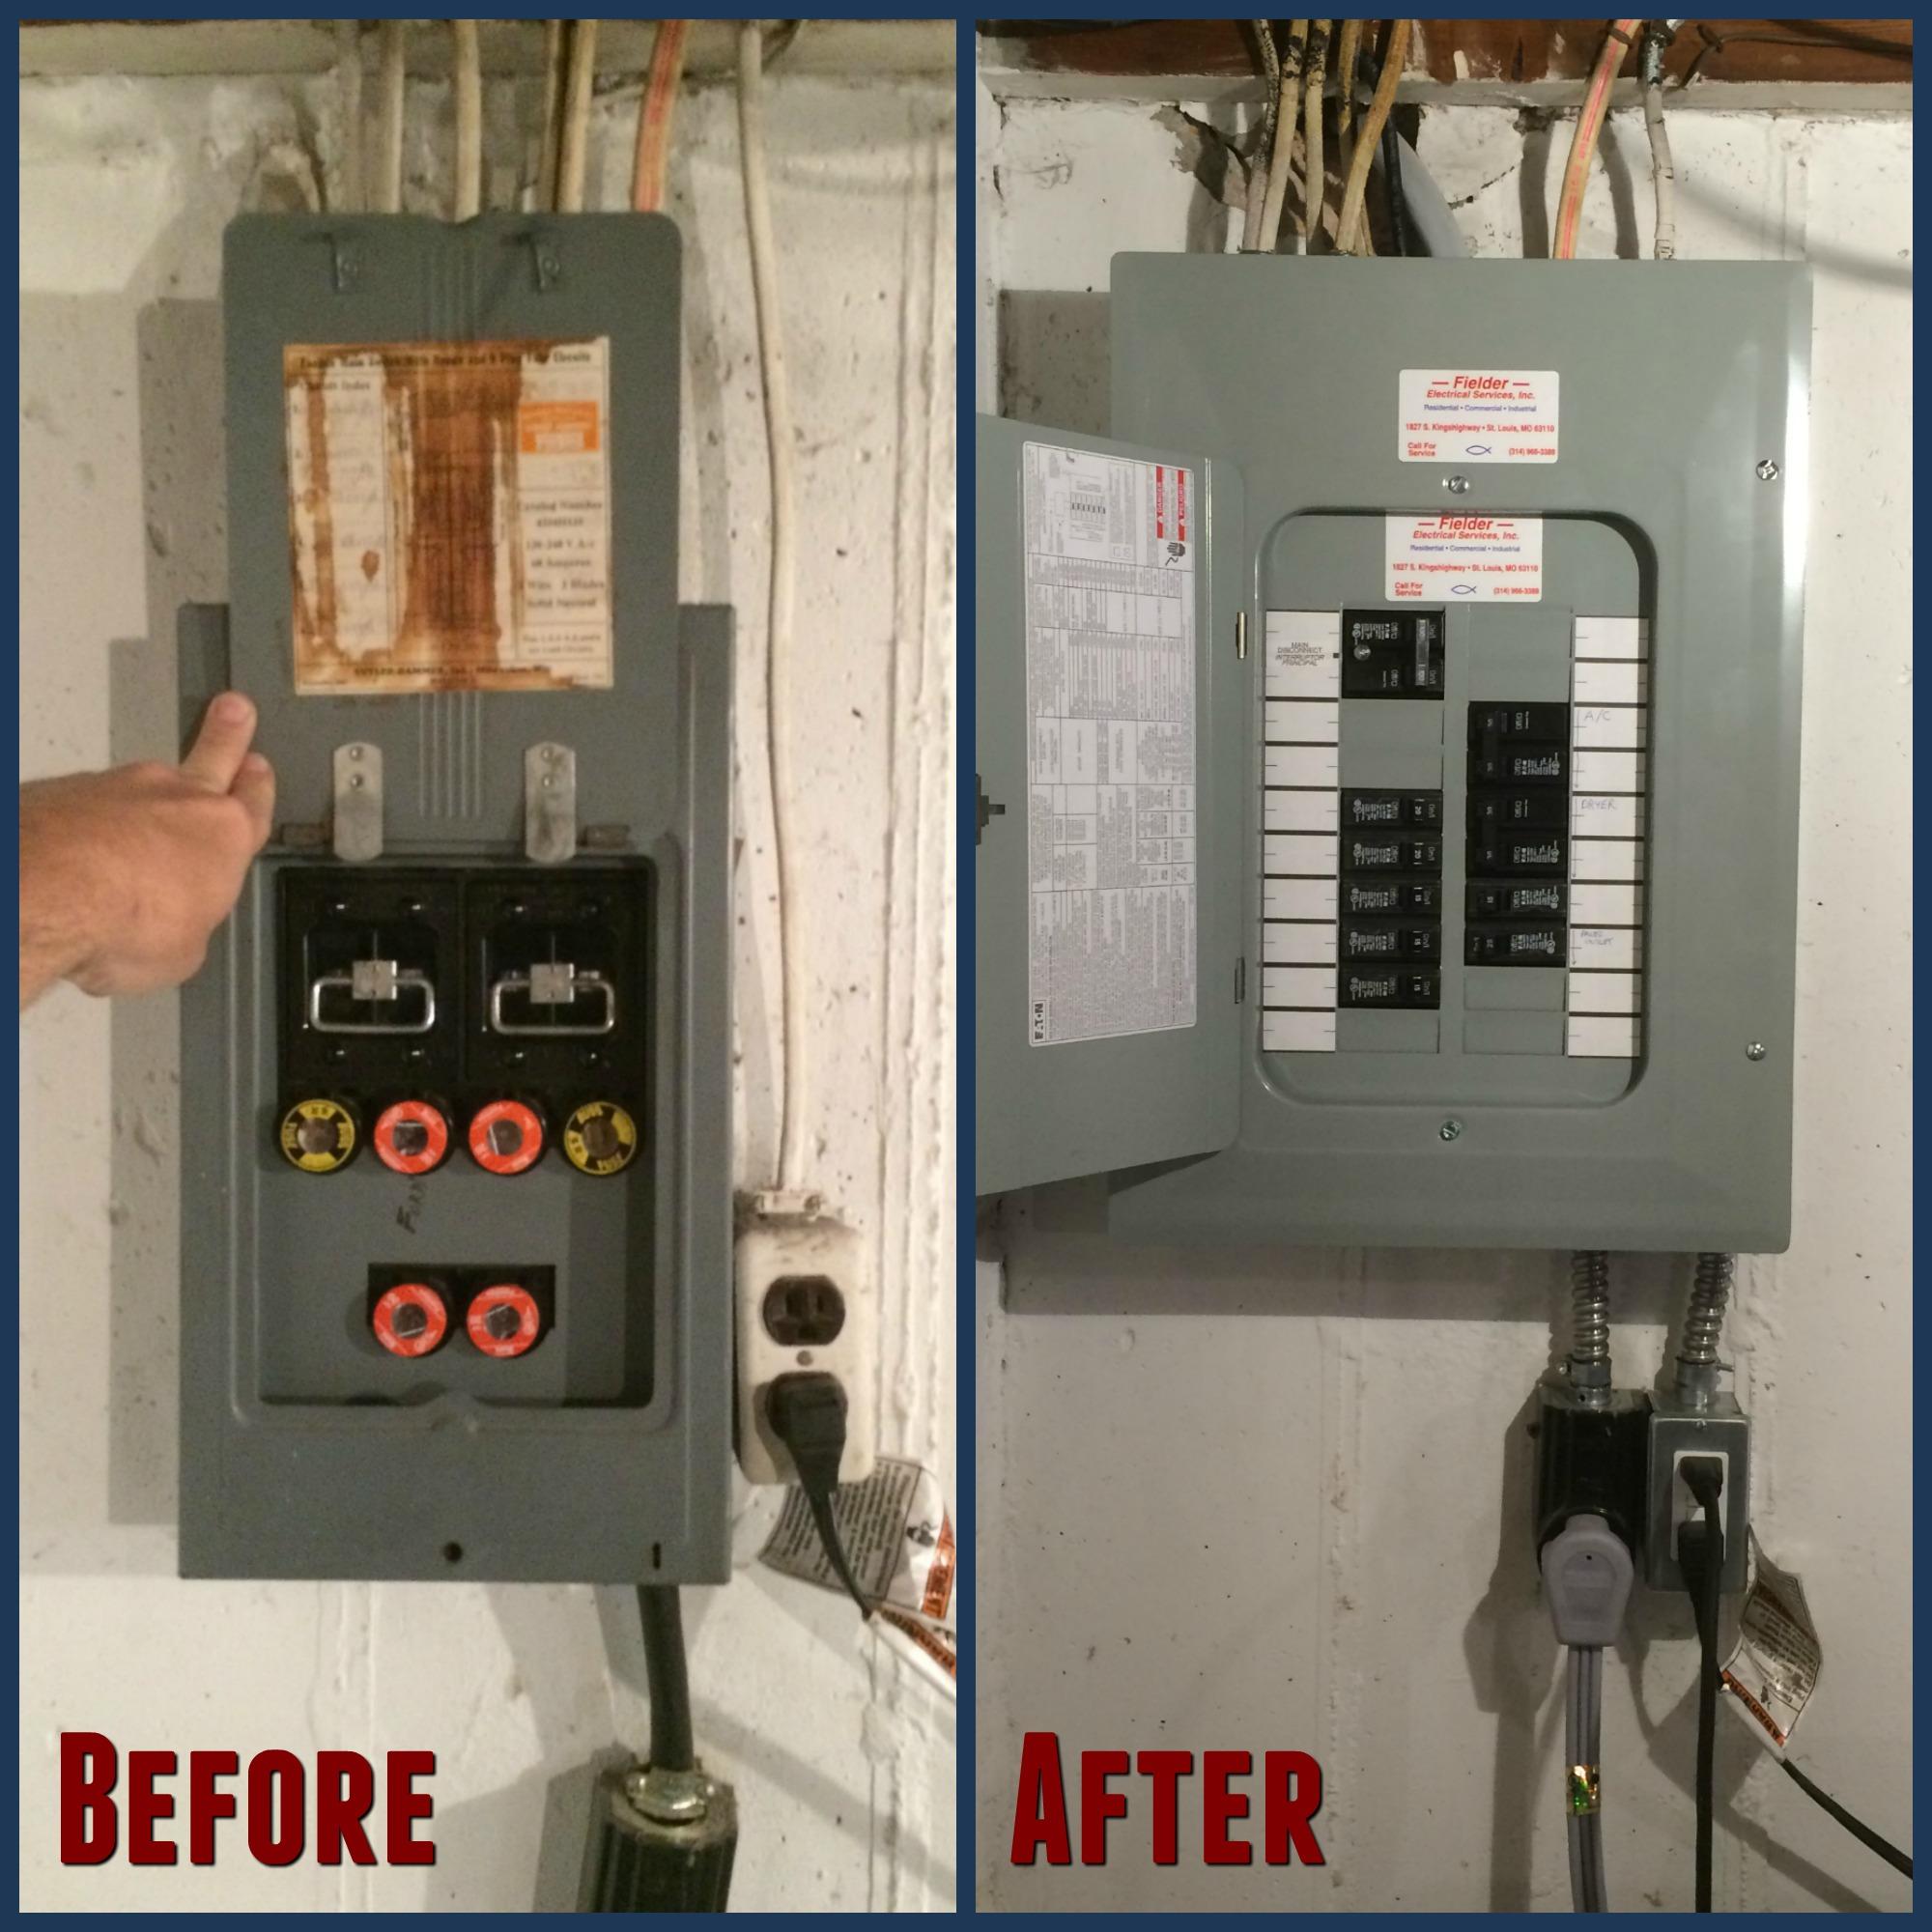 new electric panel cost  | efcaviation.com